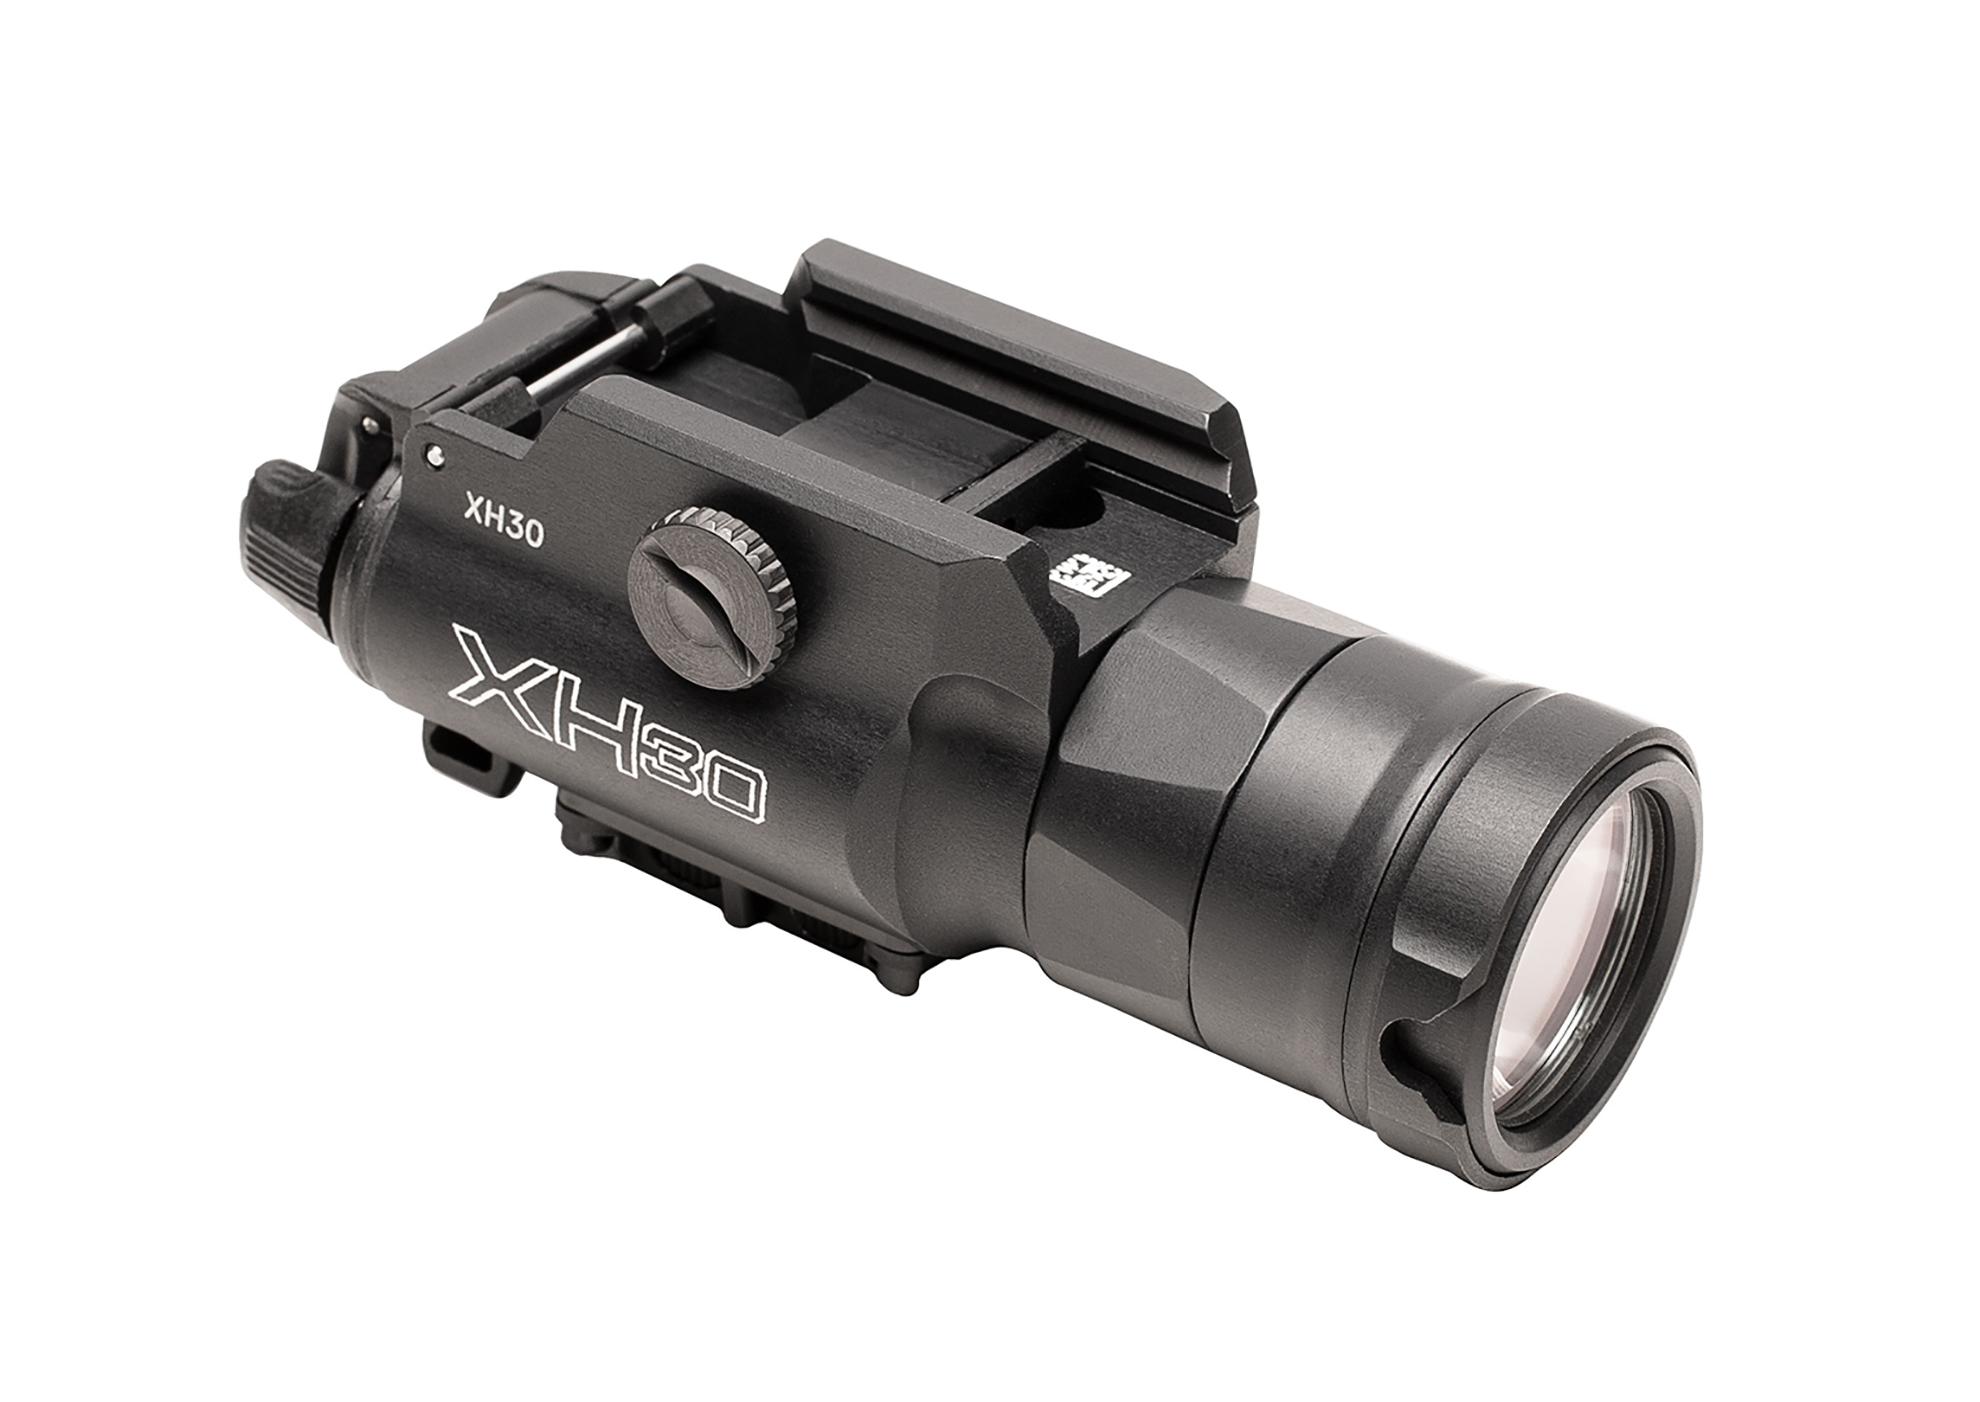 SureFire XH30 MasterFire weapon light